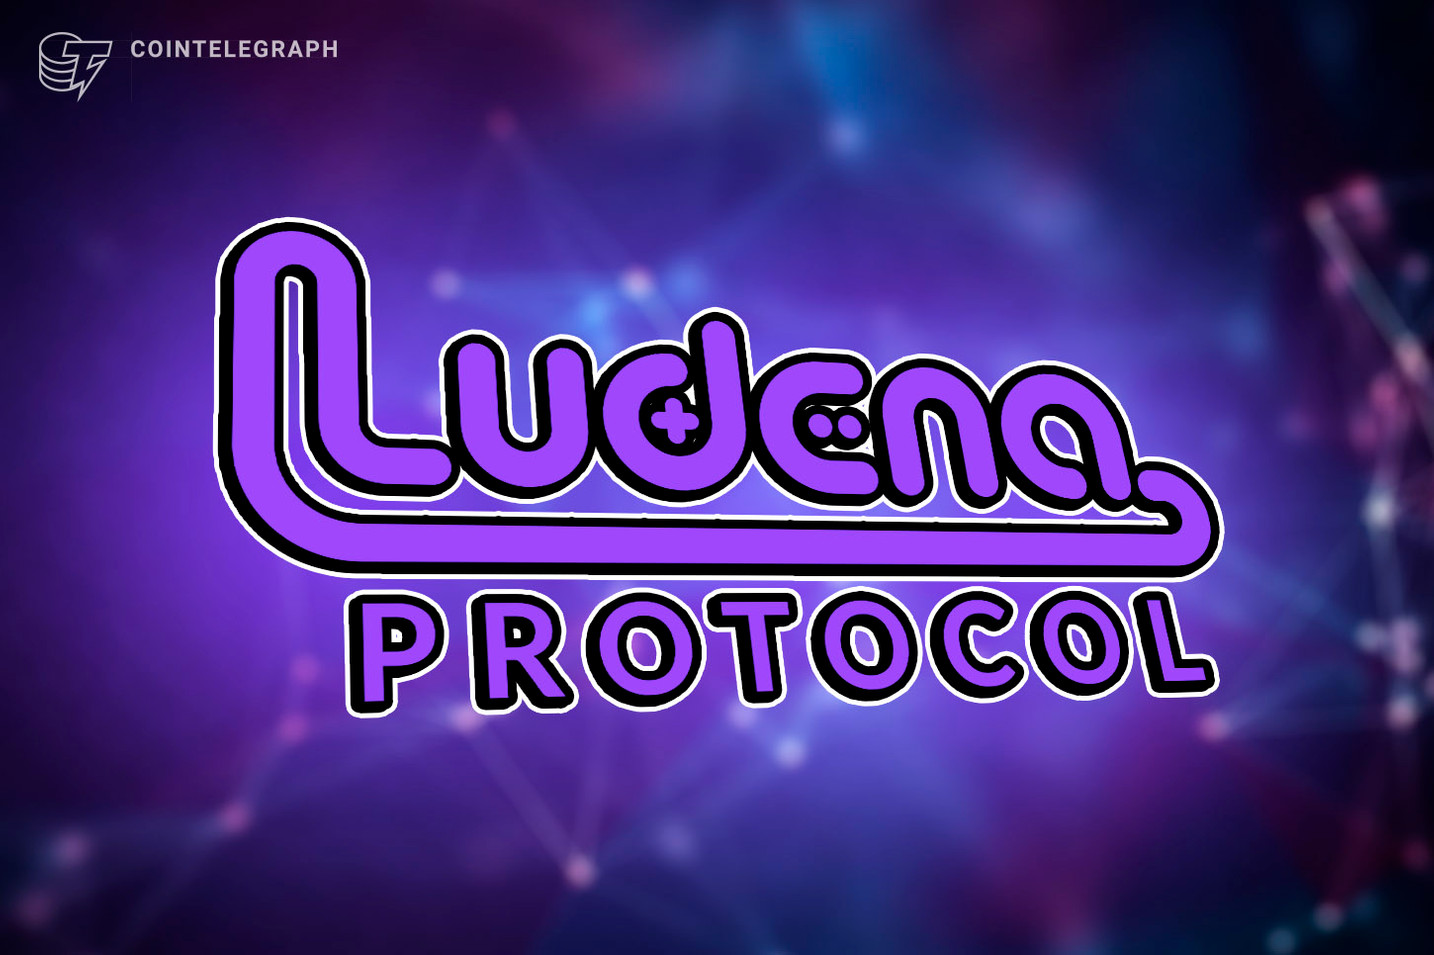 Ludena Protocol leads 15 blockchain game companies in Korea with P2E system